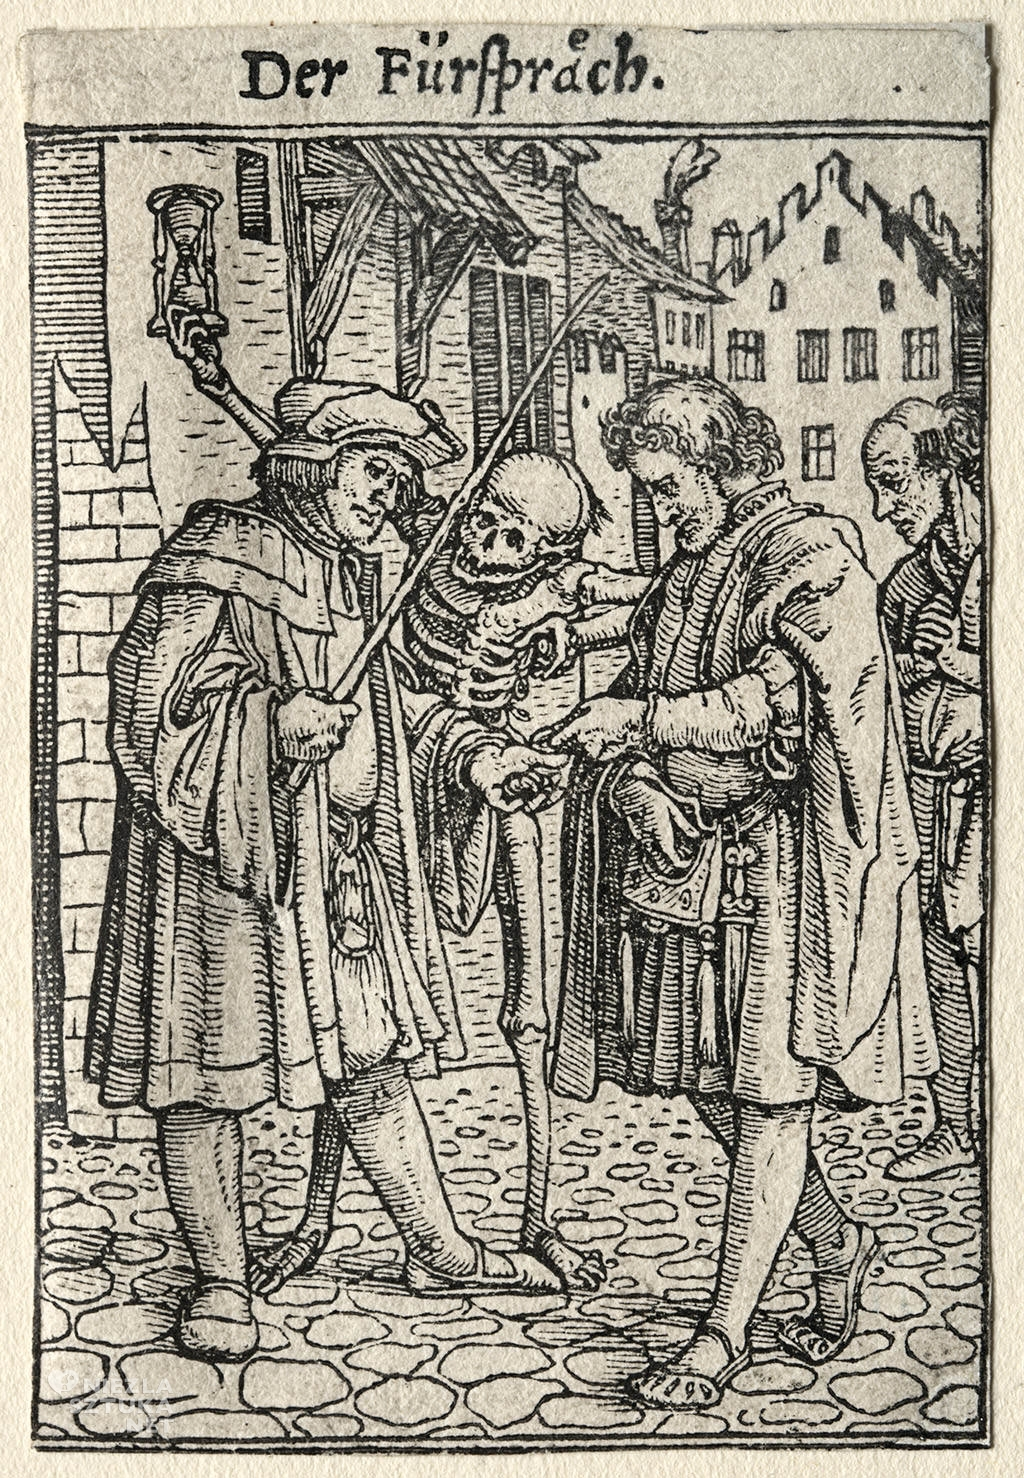 Hans Holbein, Taniec śmierci, Niezła sztuka